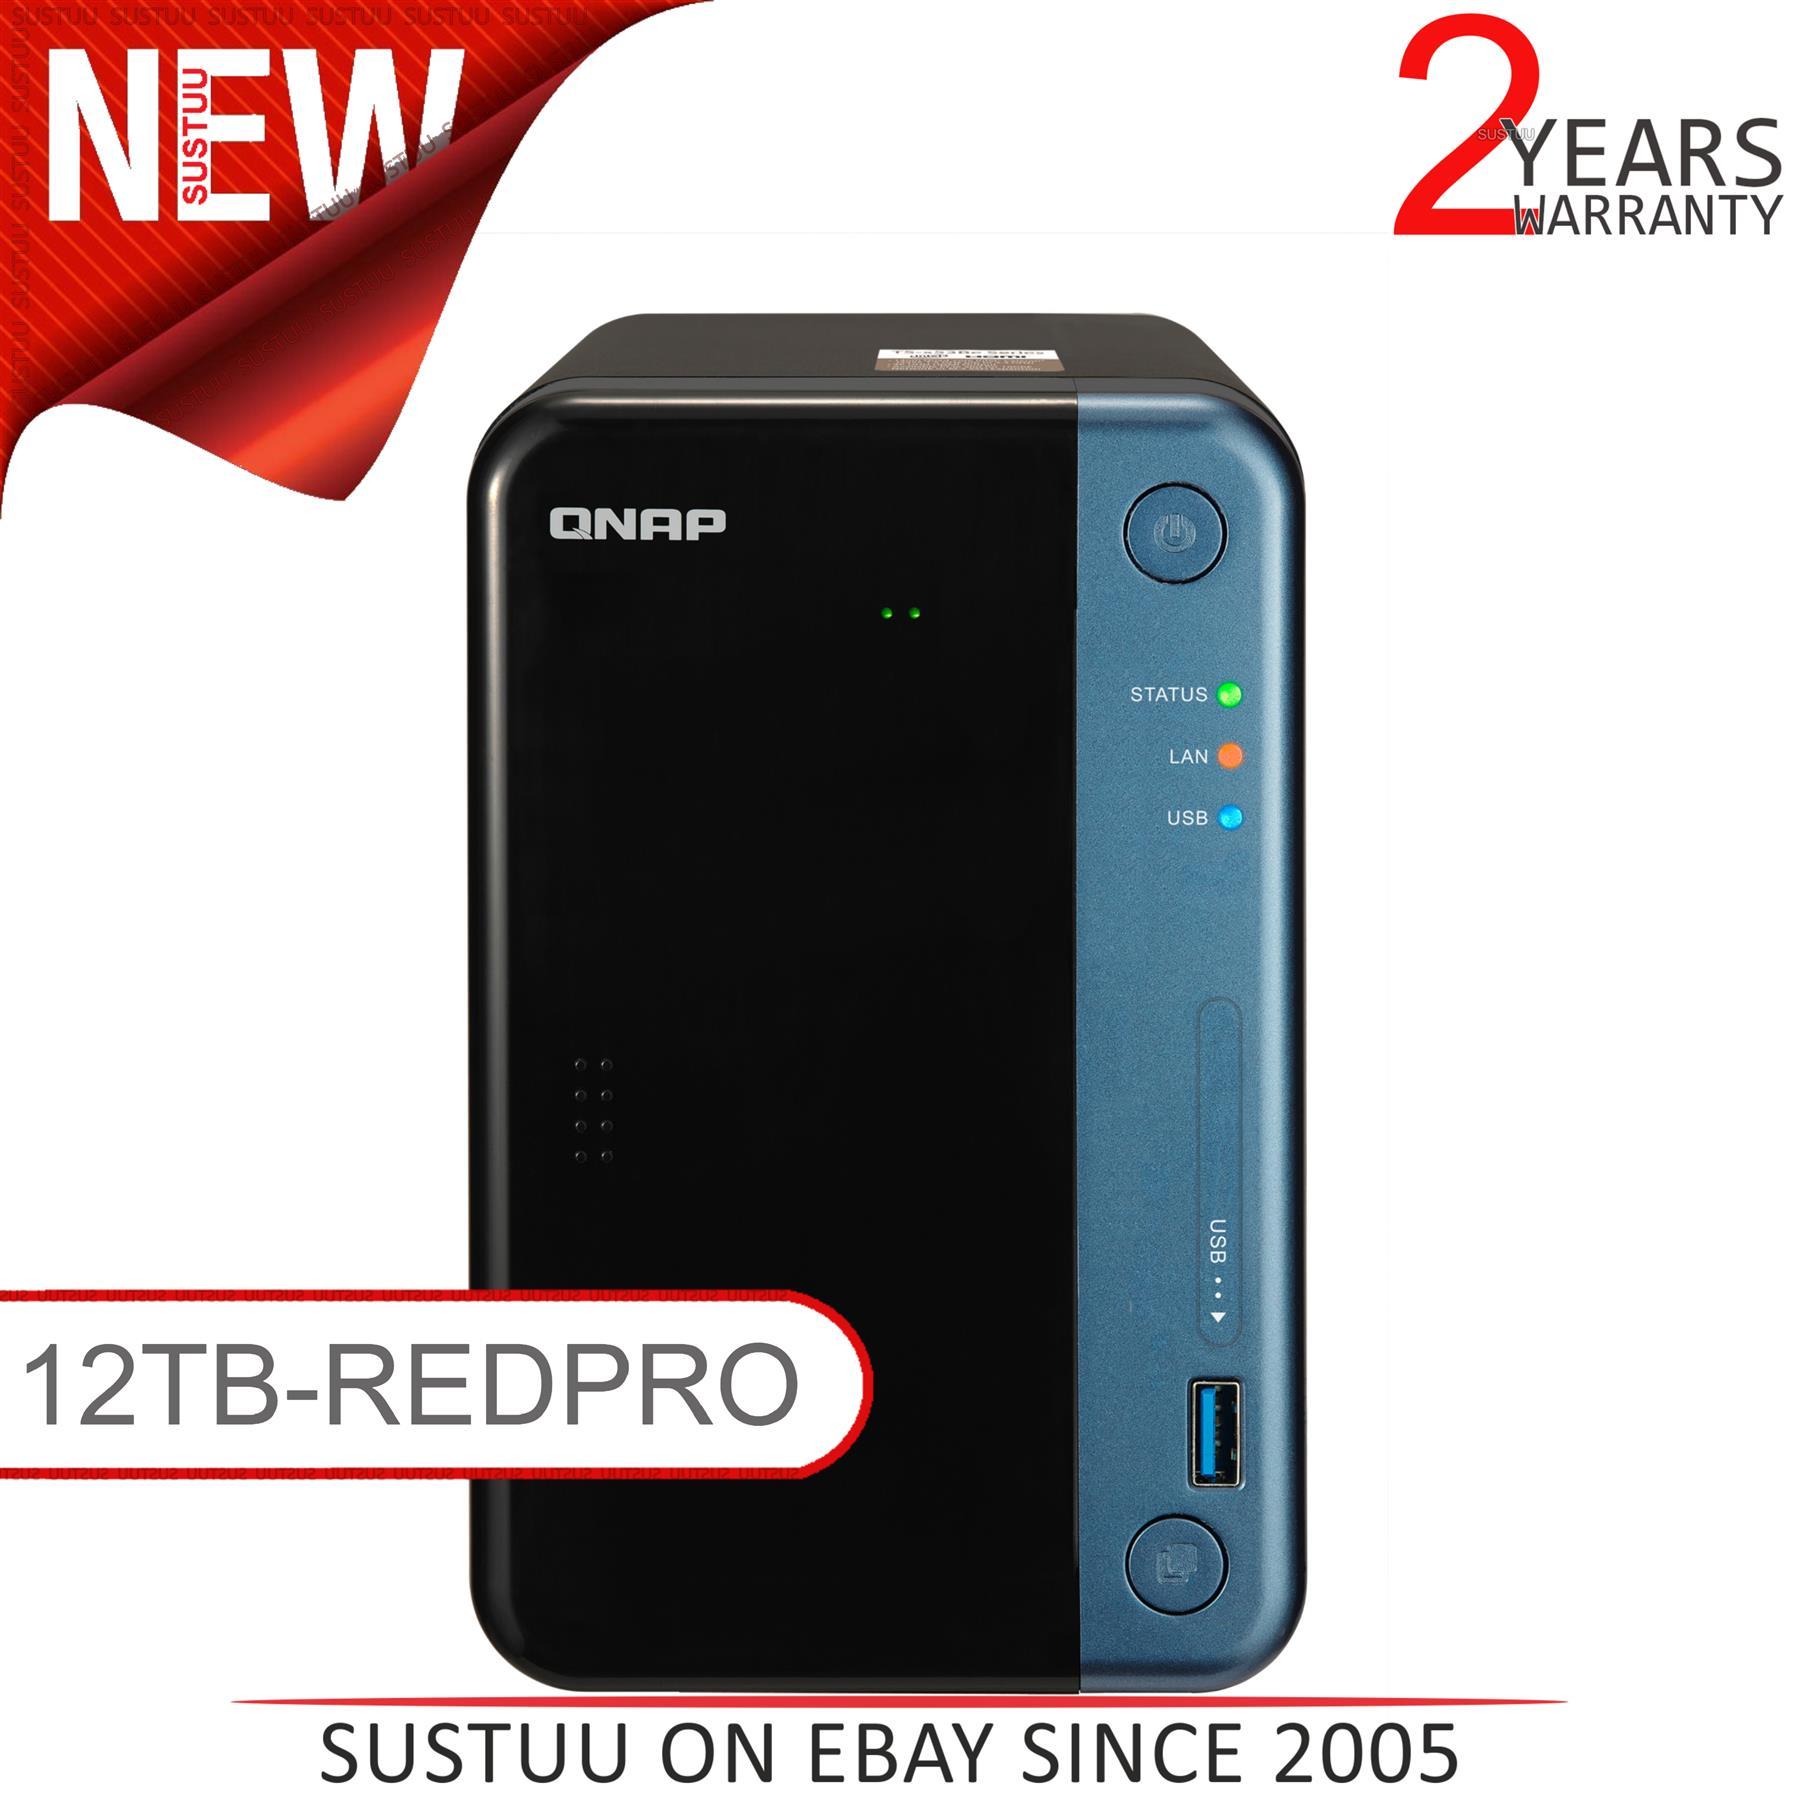 QNAP TS-453Be-2G 16TB 4 Bay Soluci/ón NAS de Escritorio Instalado con 4 x 4 TB Western Digital Red Drives